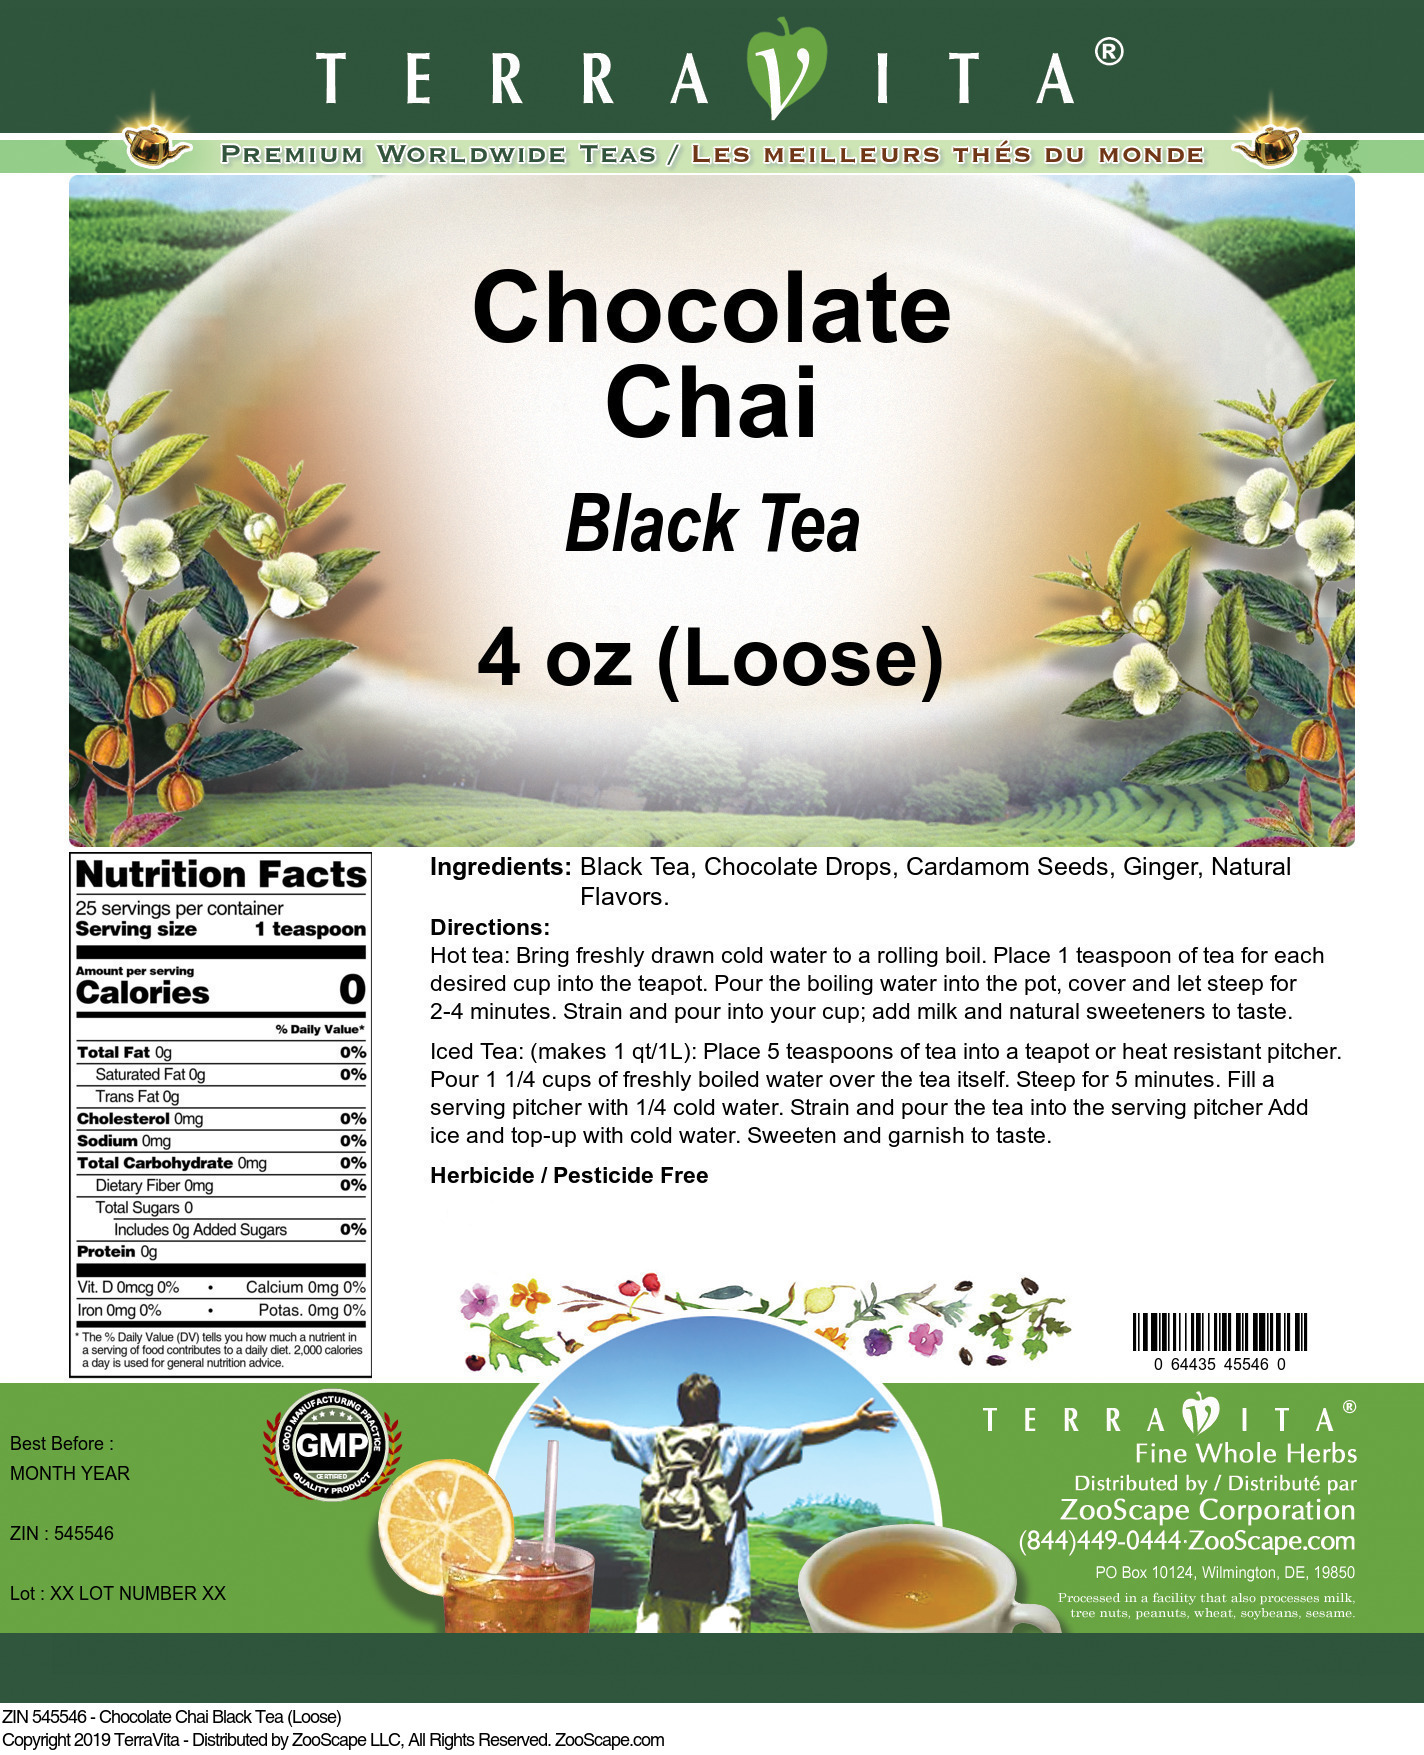 Chocolate Chai Black Tea (Loose)